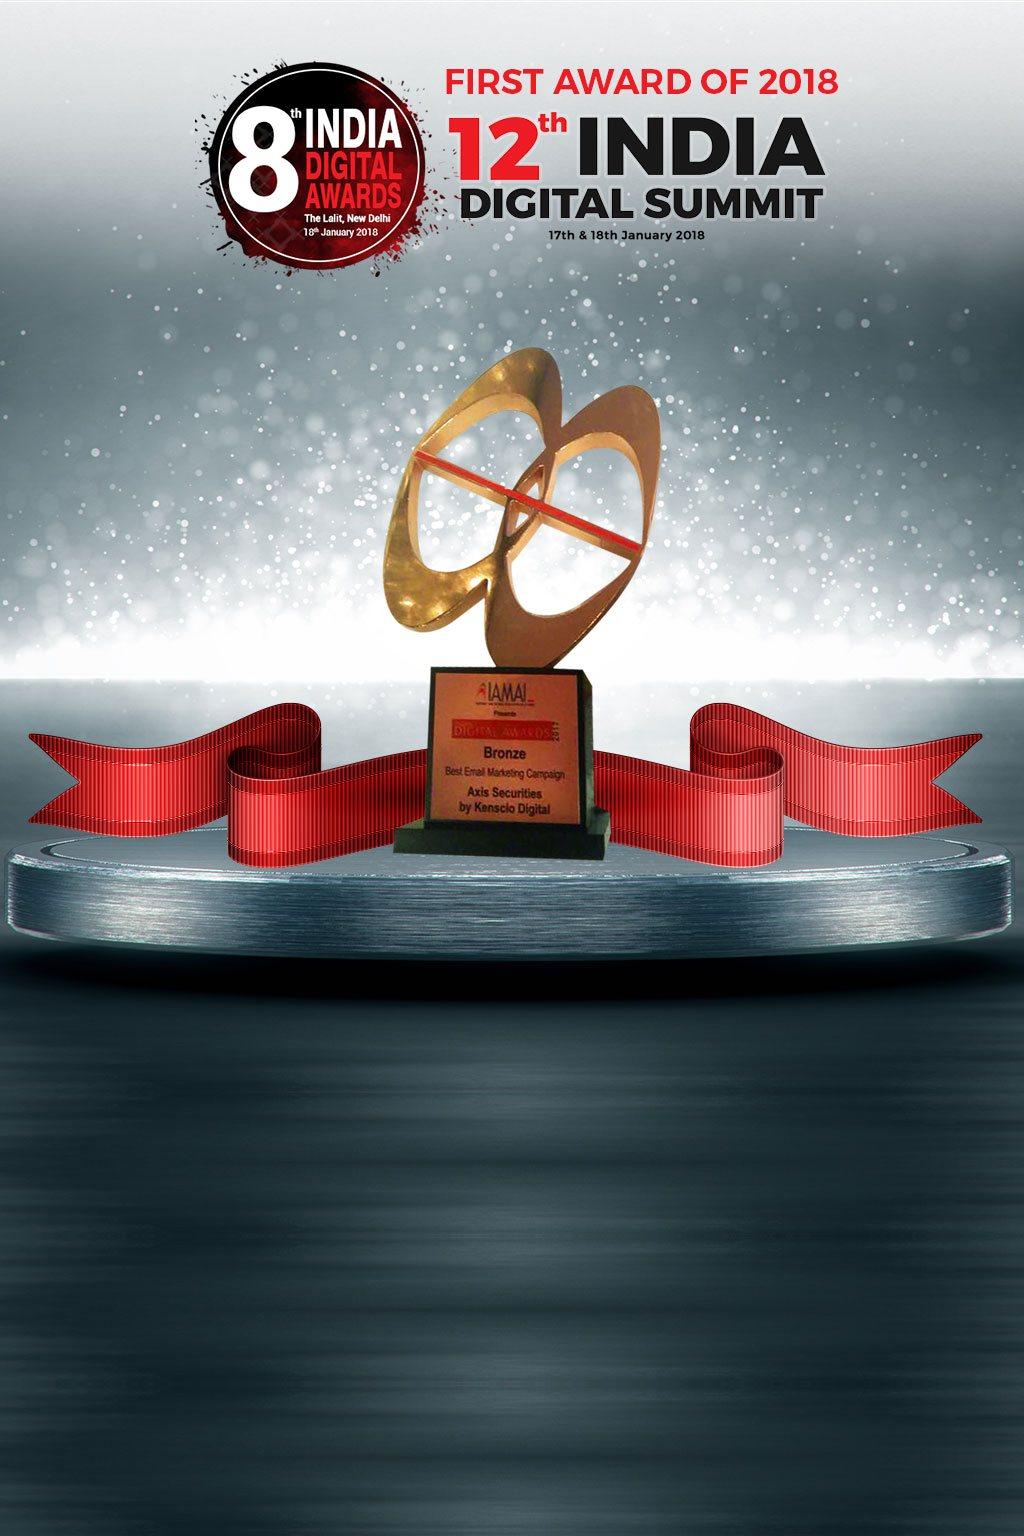 First Award of 2018 12th INDIA Digital Summit